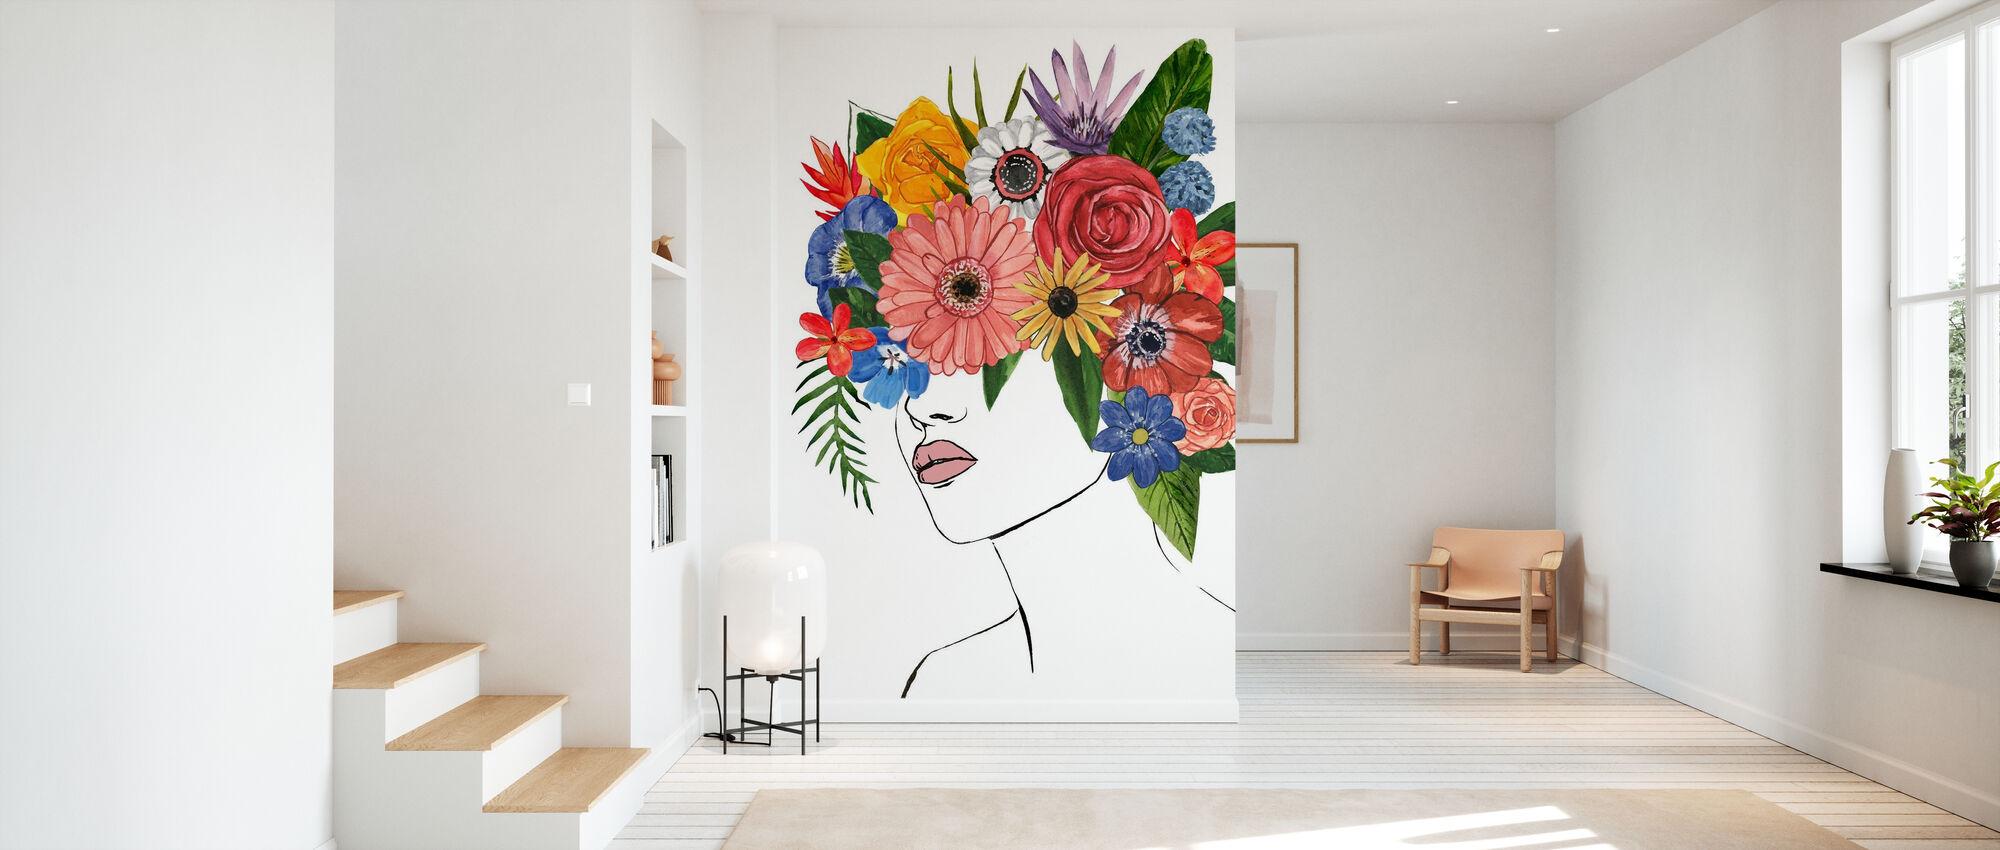 Flower Lady - Wallpaper - Hallway